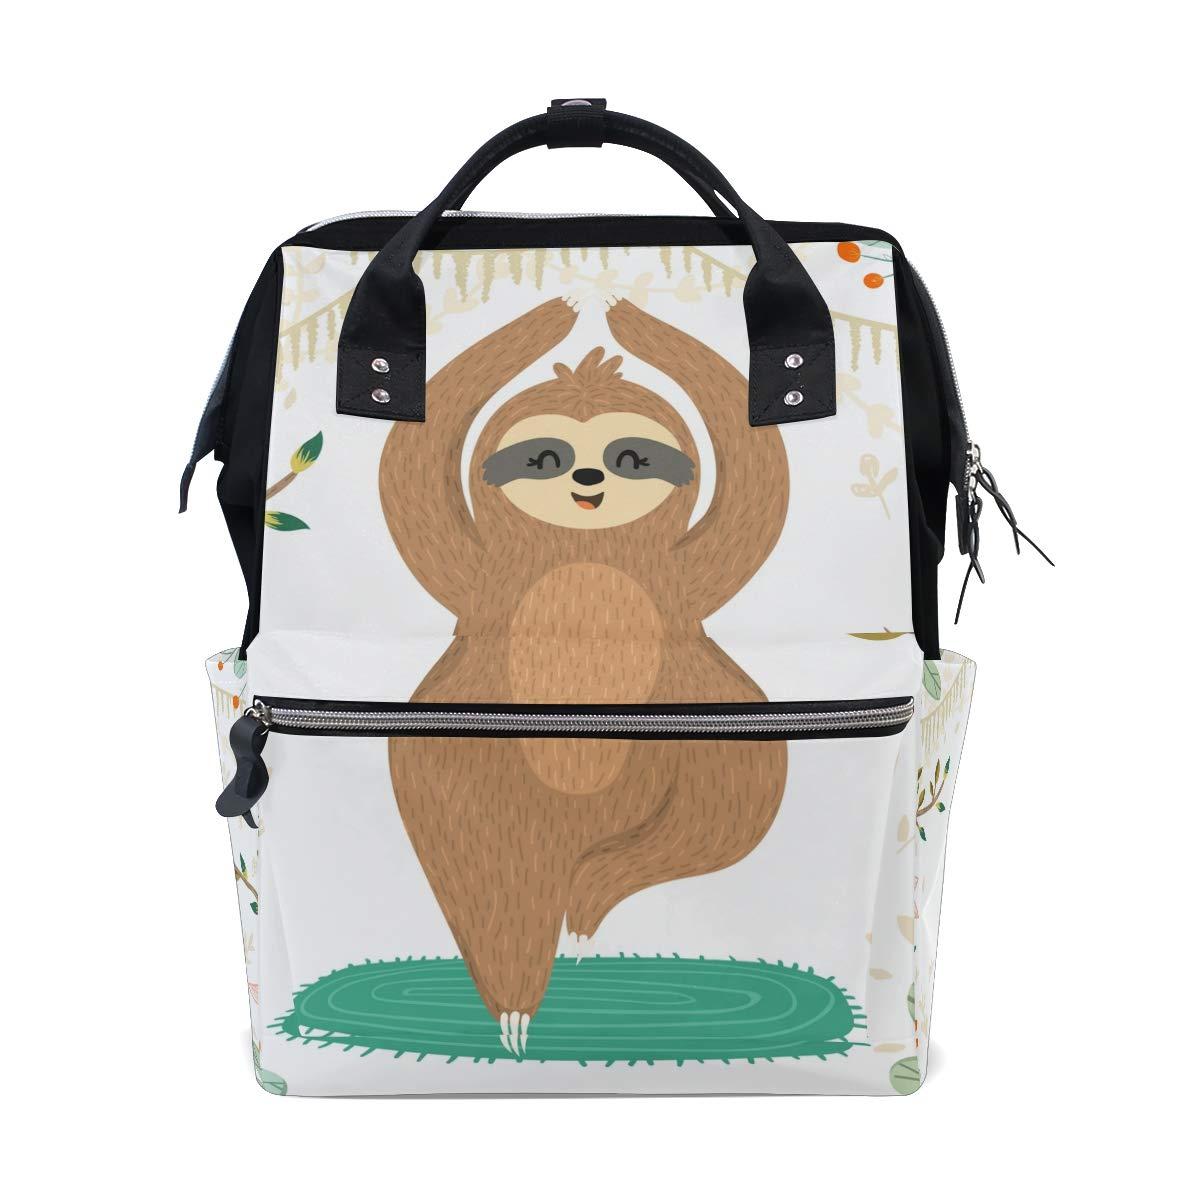 MERRYSUGAR Diaper Bag Backpack Lovely Sloth Yoga White Baby Bag School Backpack Mommy Bag Large Multifunction Travel Bag